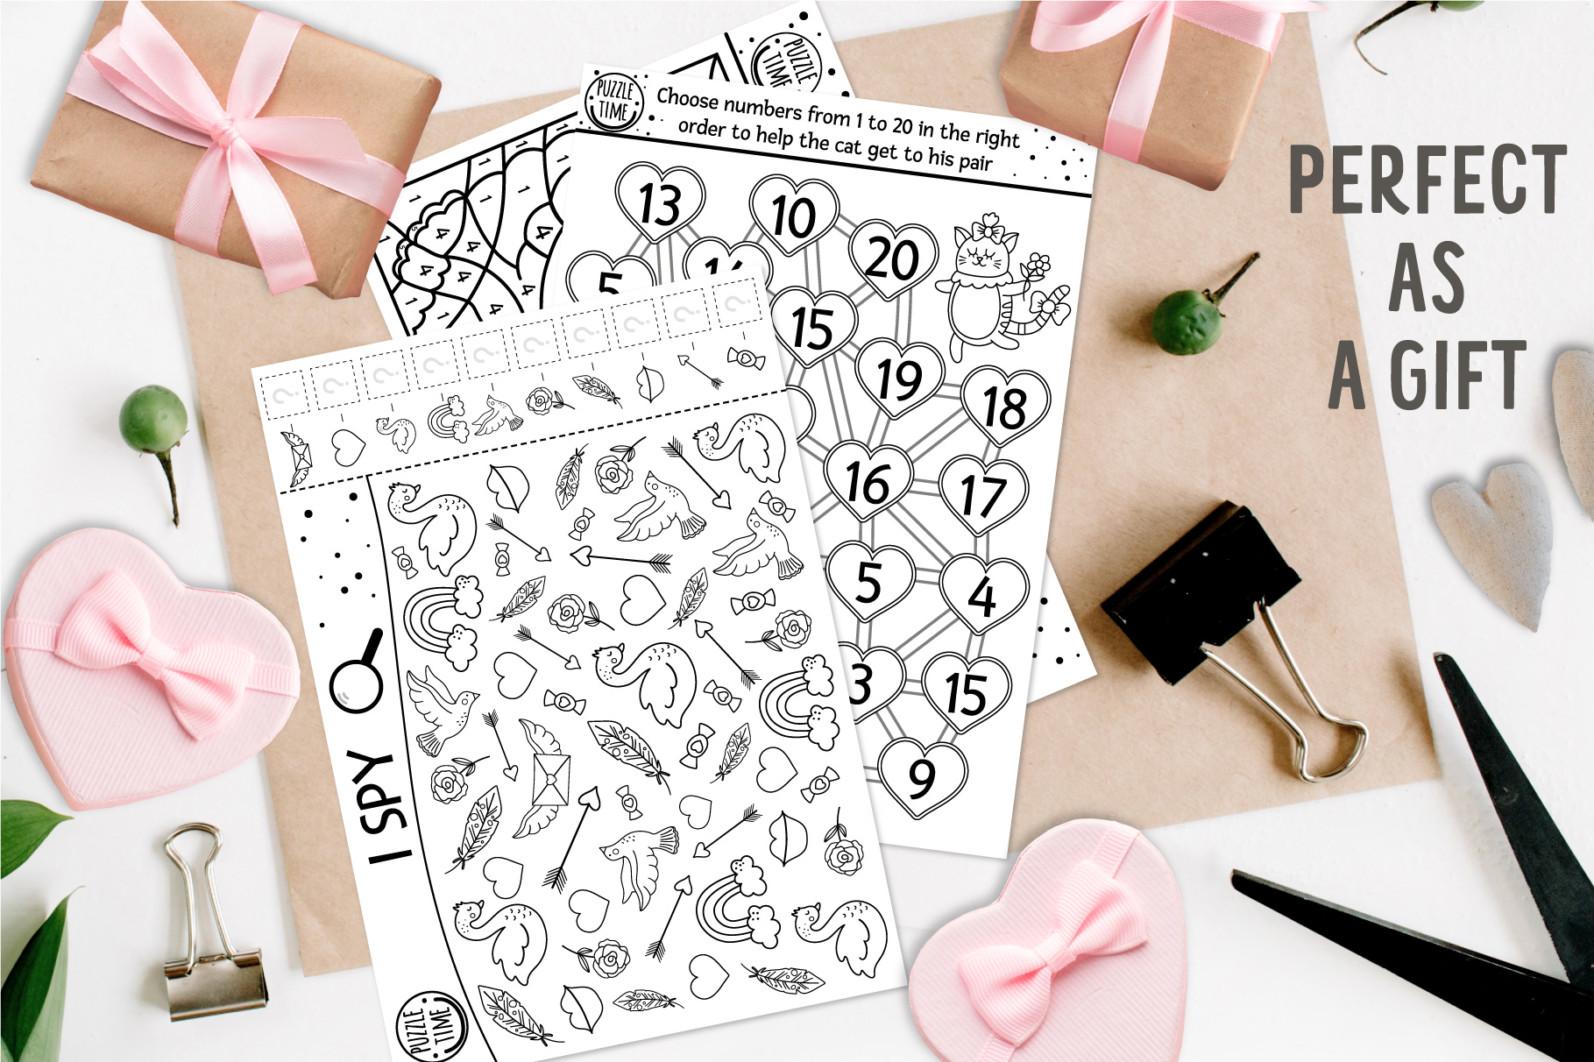 Saint Valentine's Coloring Games - 13 3 -